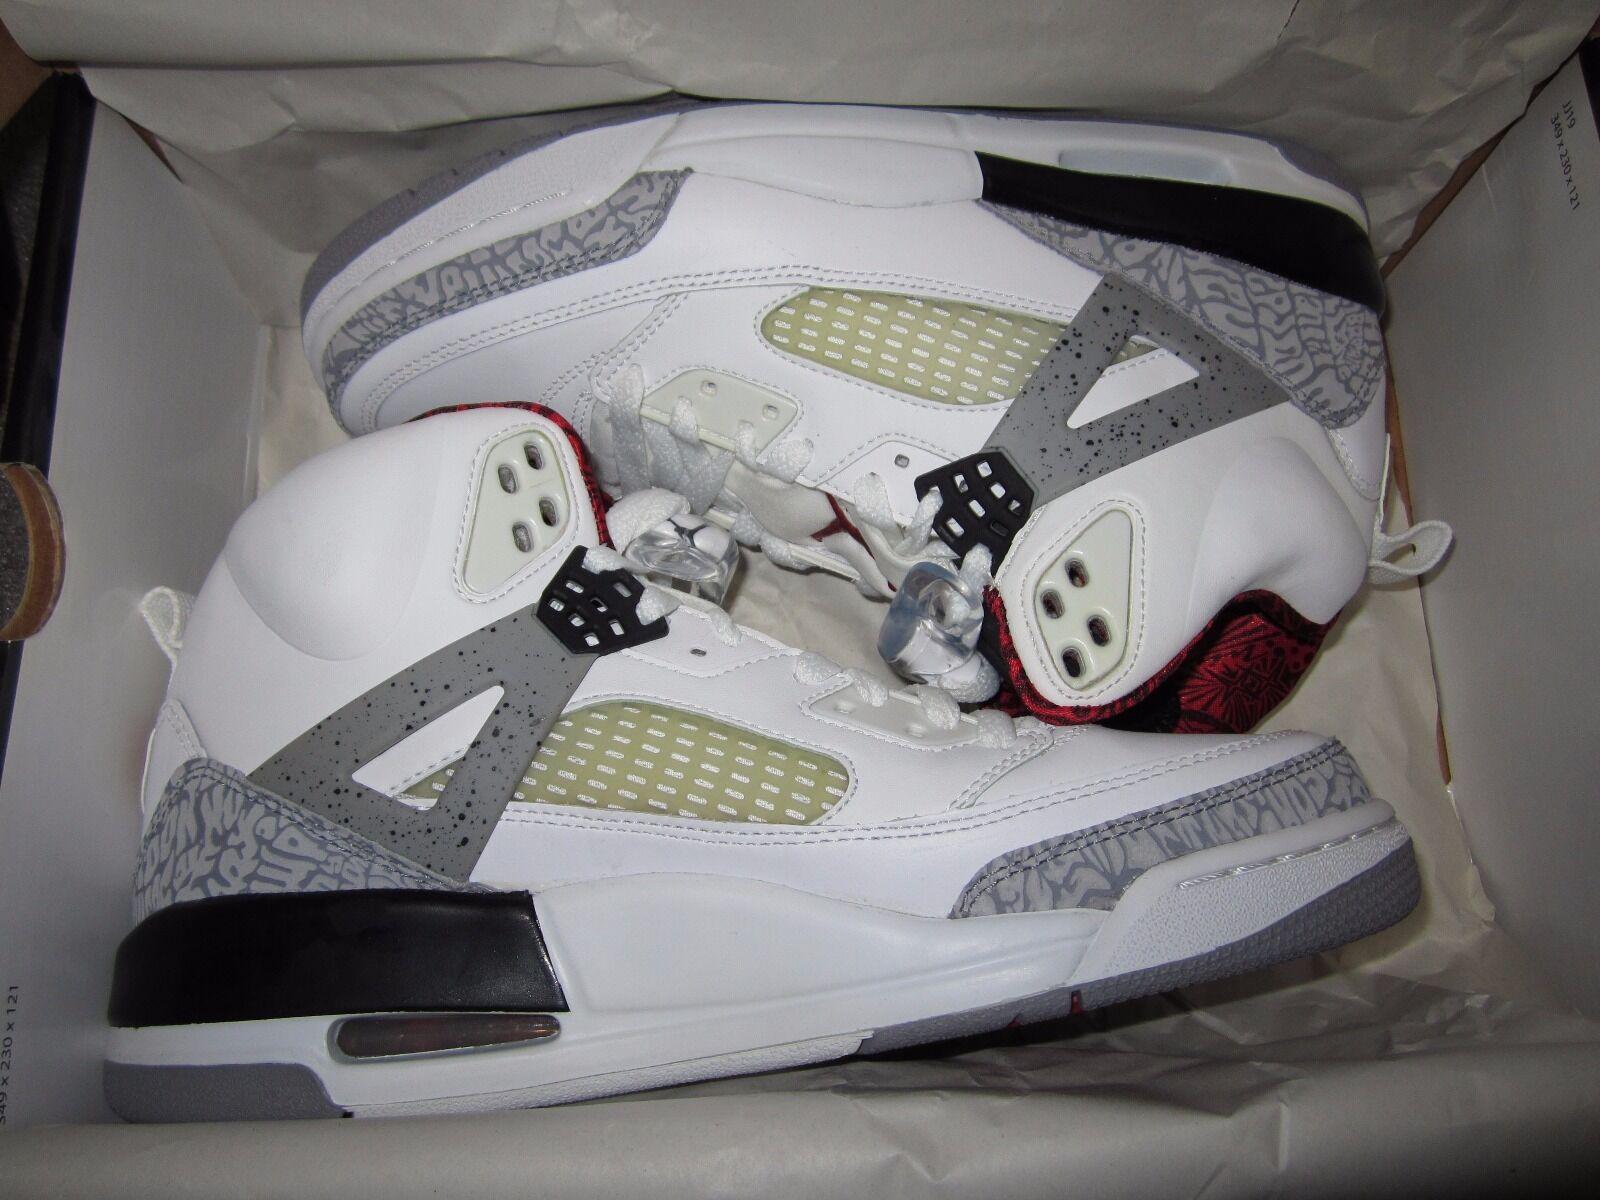 2008 Nike 9 Air Jordan Spiz'Ike White/Cement Grey-Vrsty Rd-Blk Sz 9 Nike BRAND NEW DS! 48195f